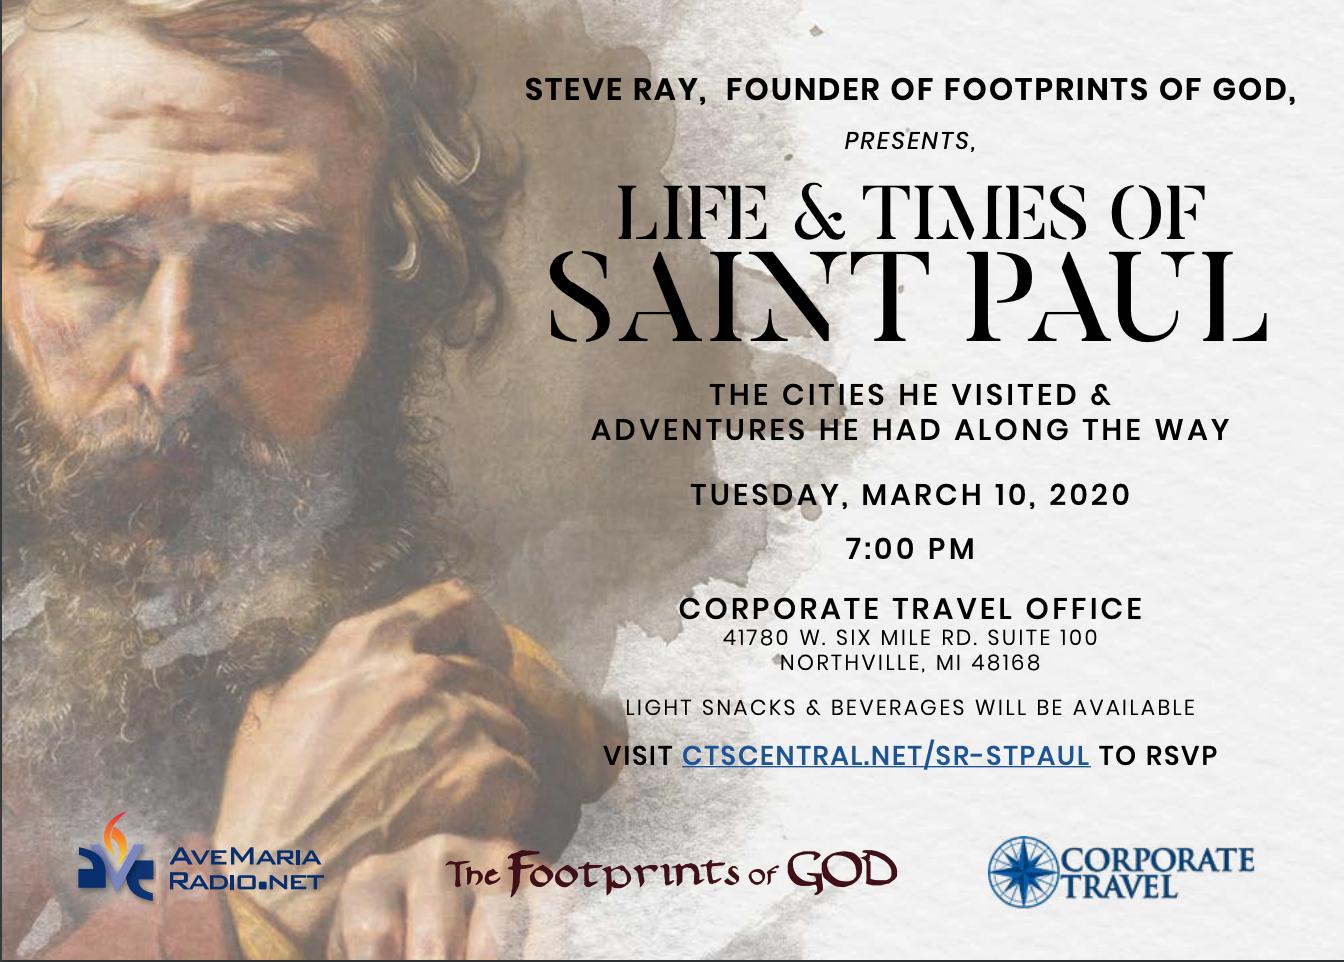 Life & Times of Saint Paul